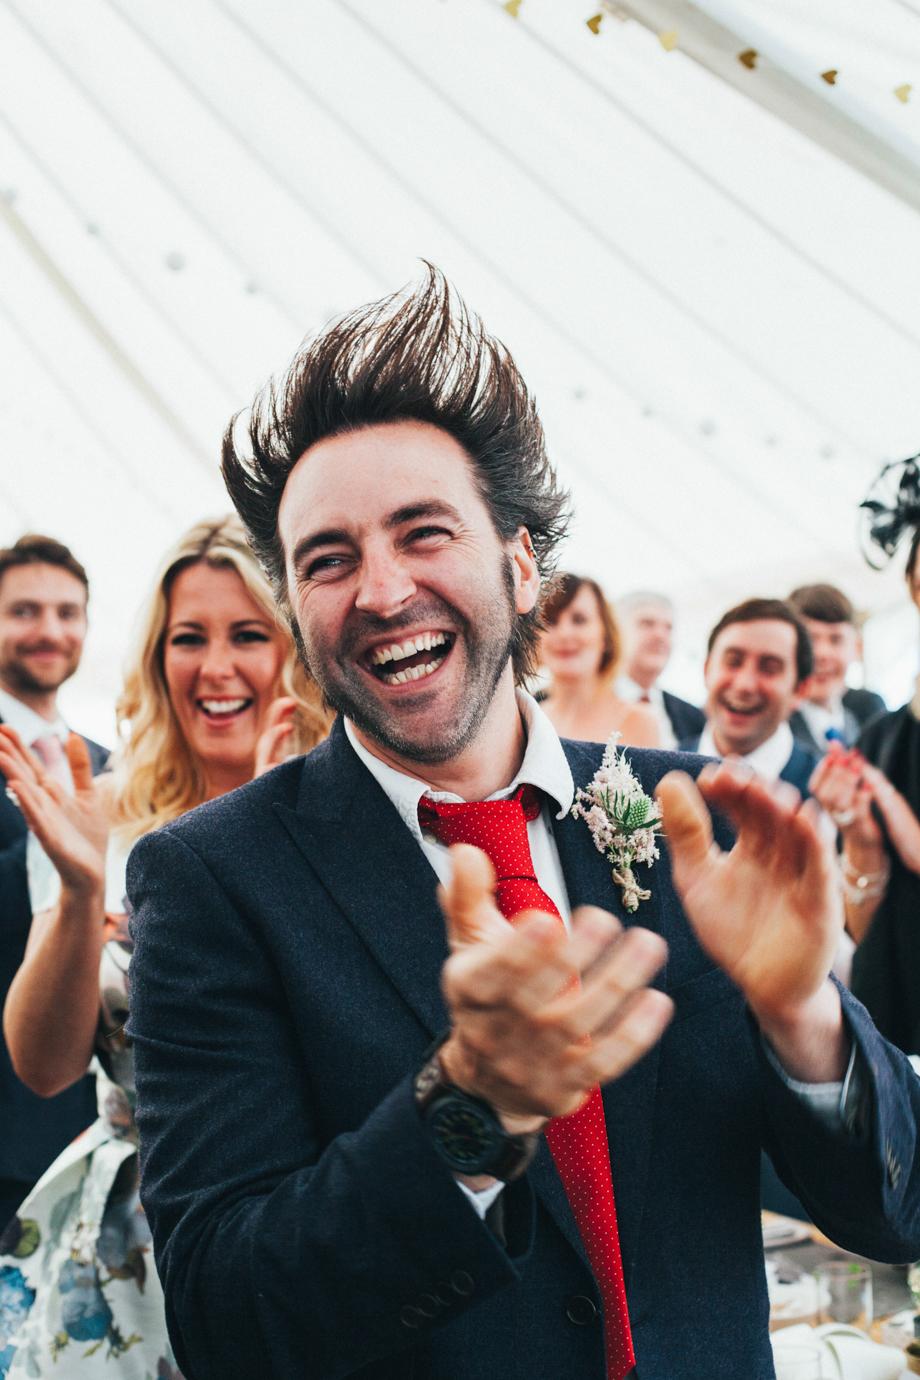 Shropshire-Festival-Wedding-47